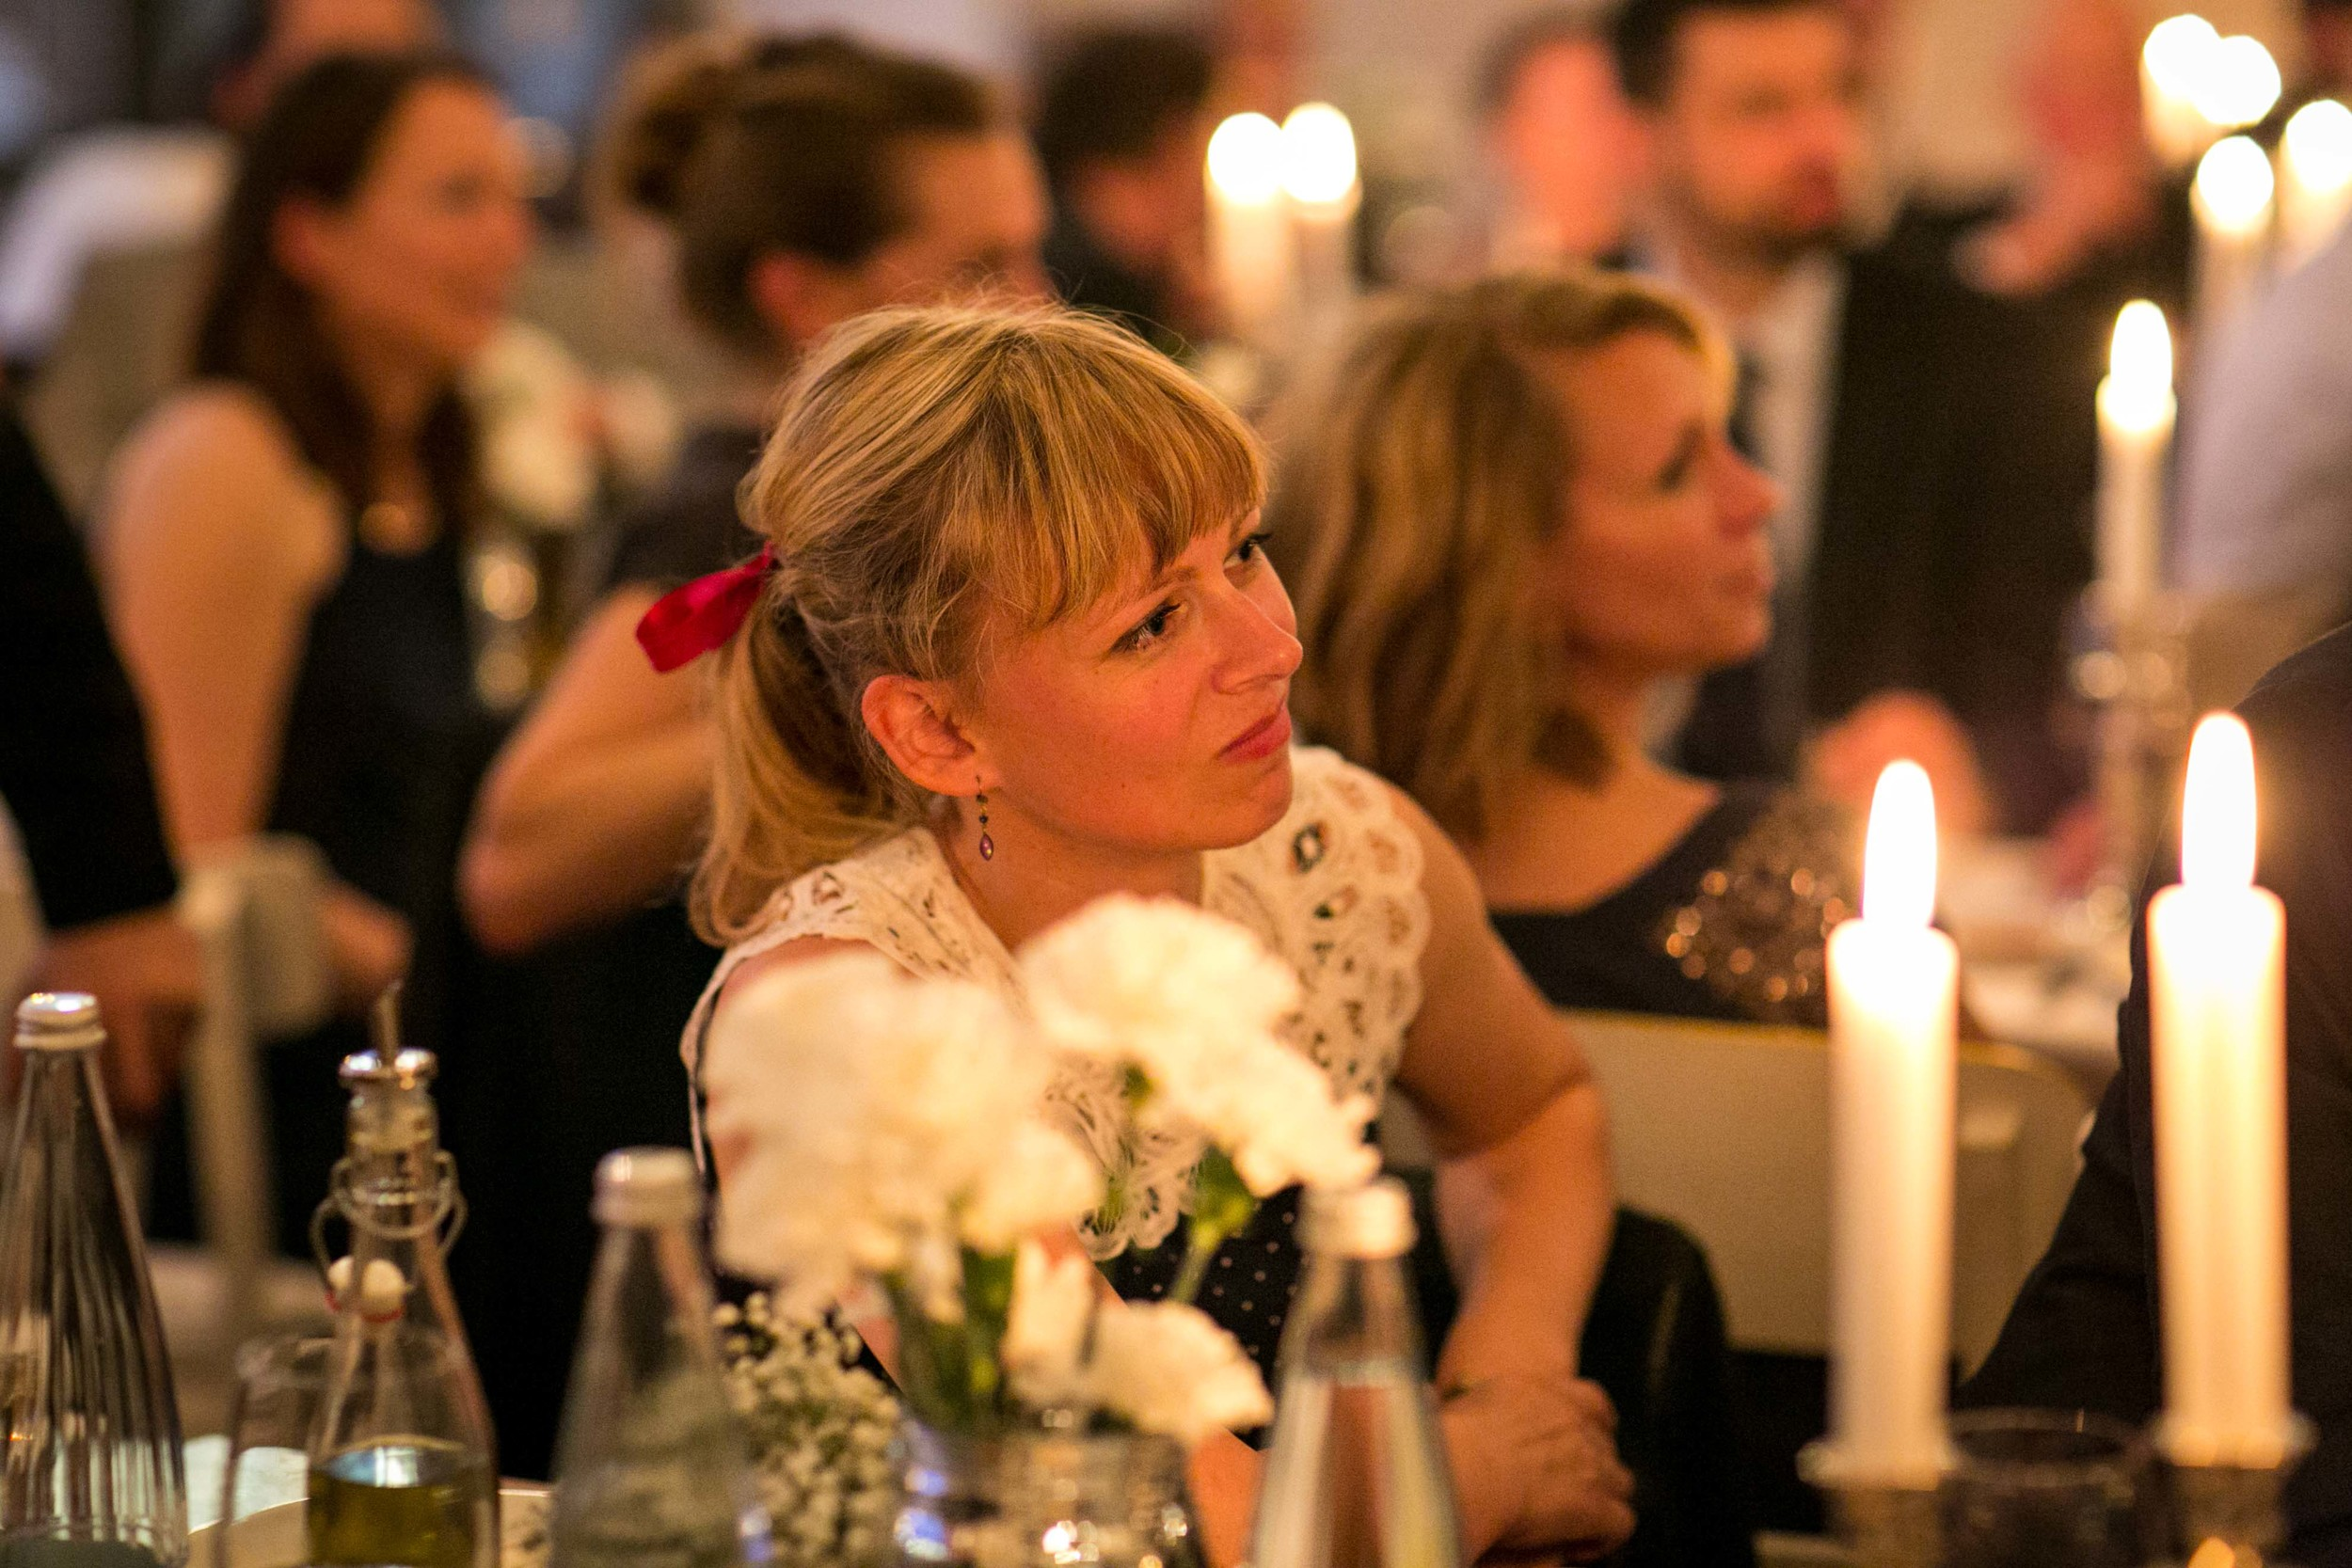 Michelberger Hotel Berlin Hochzeitsfotografie_Fran Burrows Fotografie-102.jpg